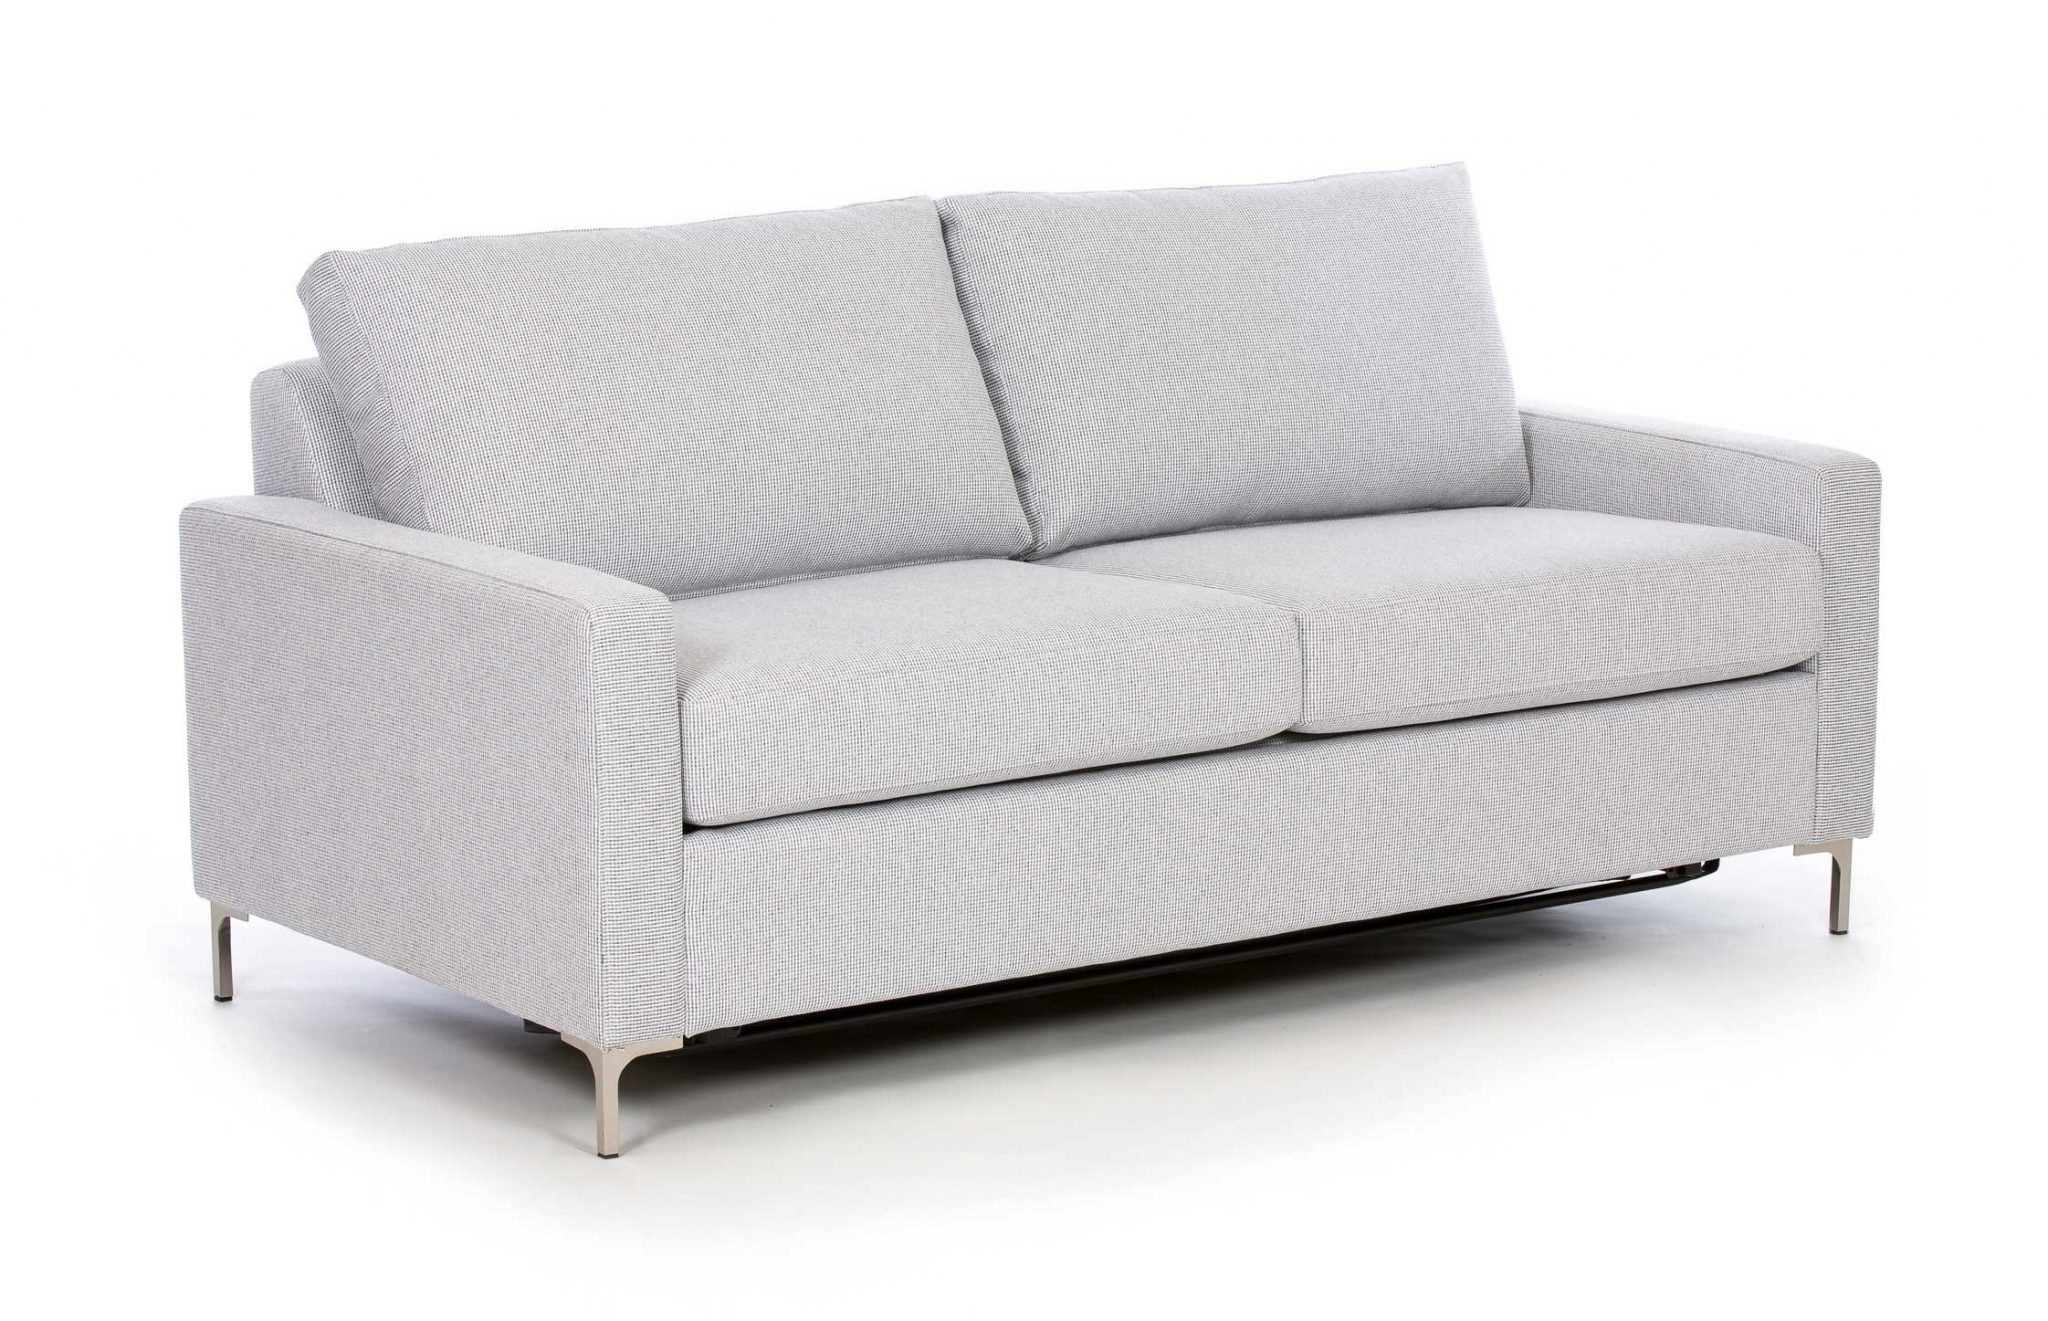 20 The Best Unusual Sofa